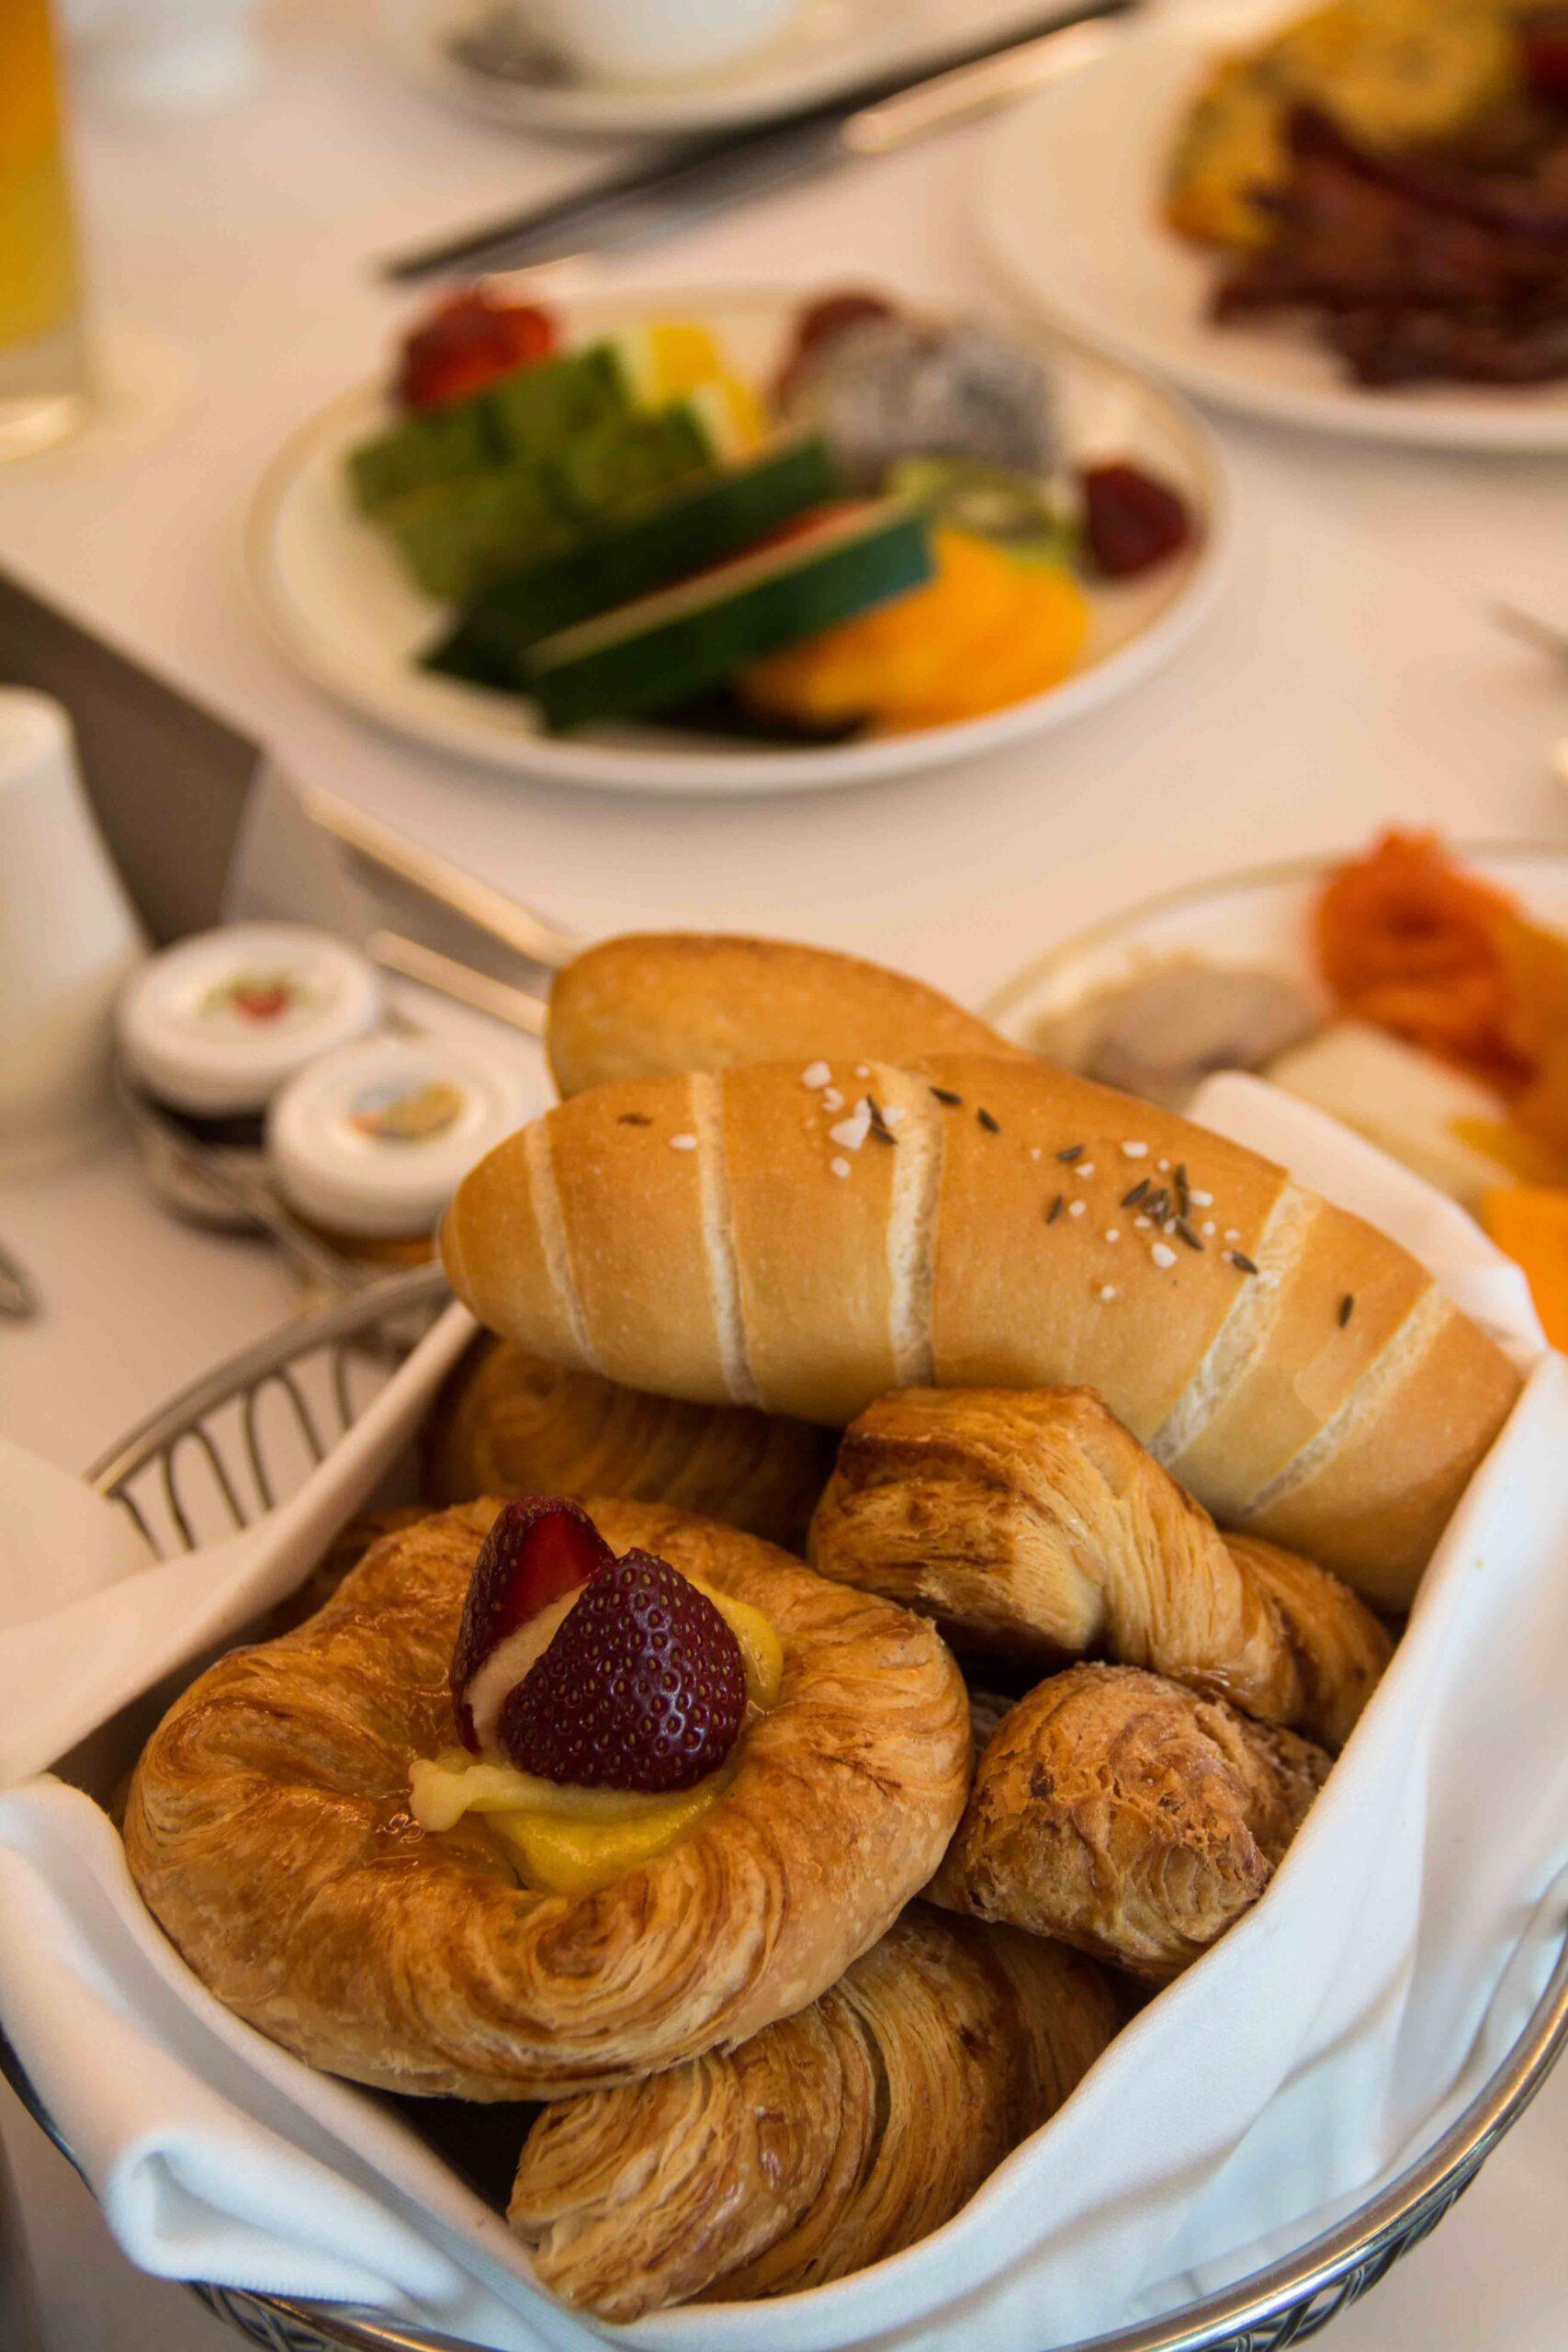 hotel indonesia kempinski jakarta breakfast